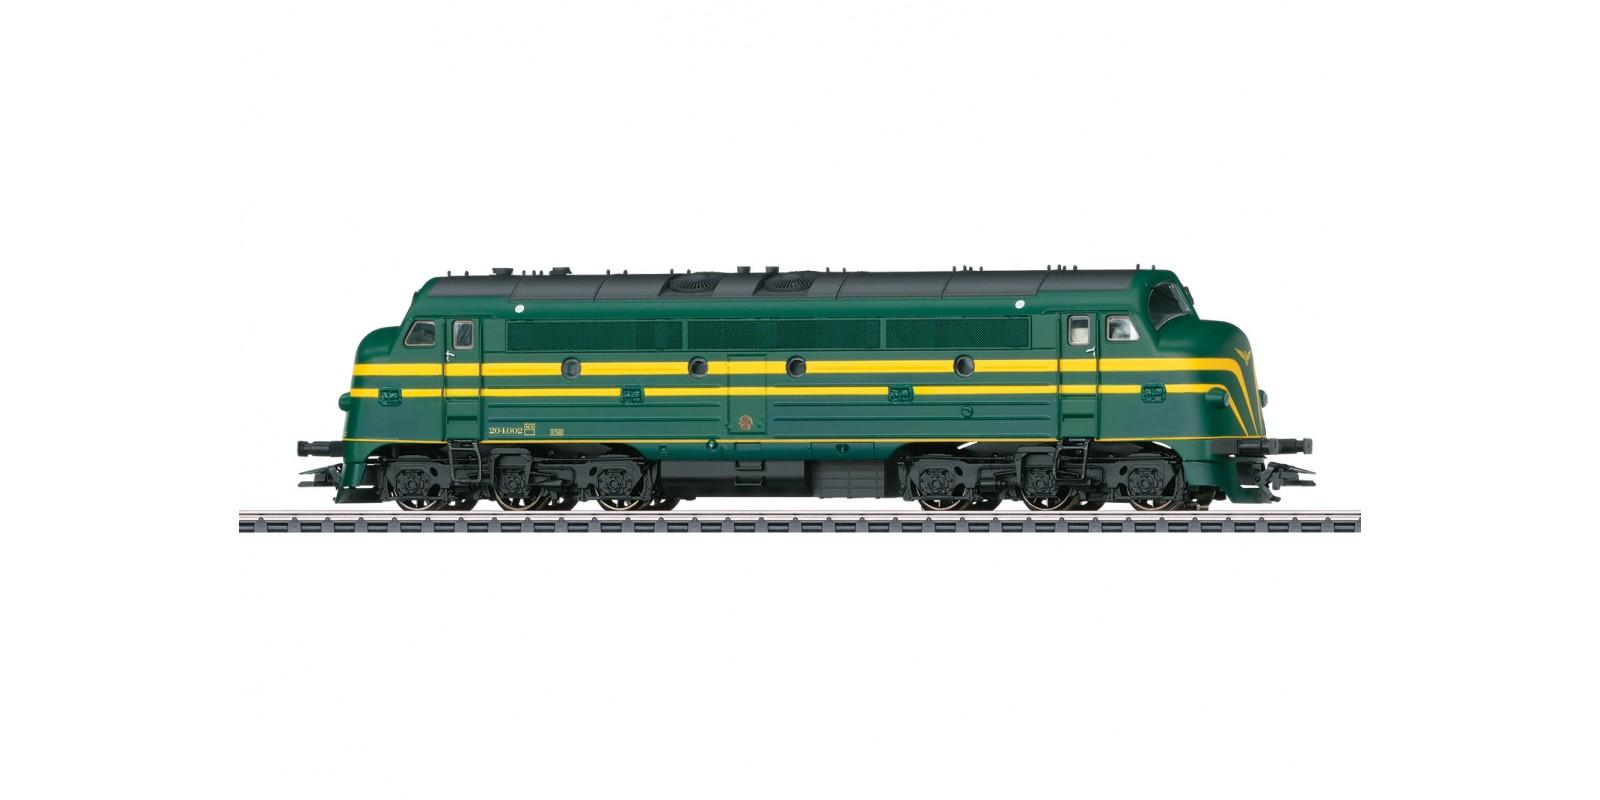 39676 Class 204 Diesel Locomotive